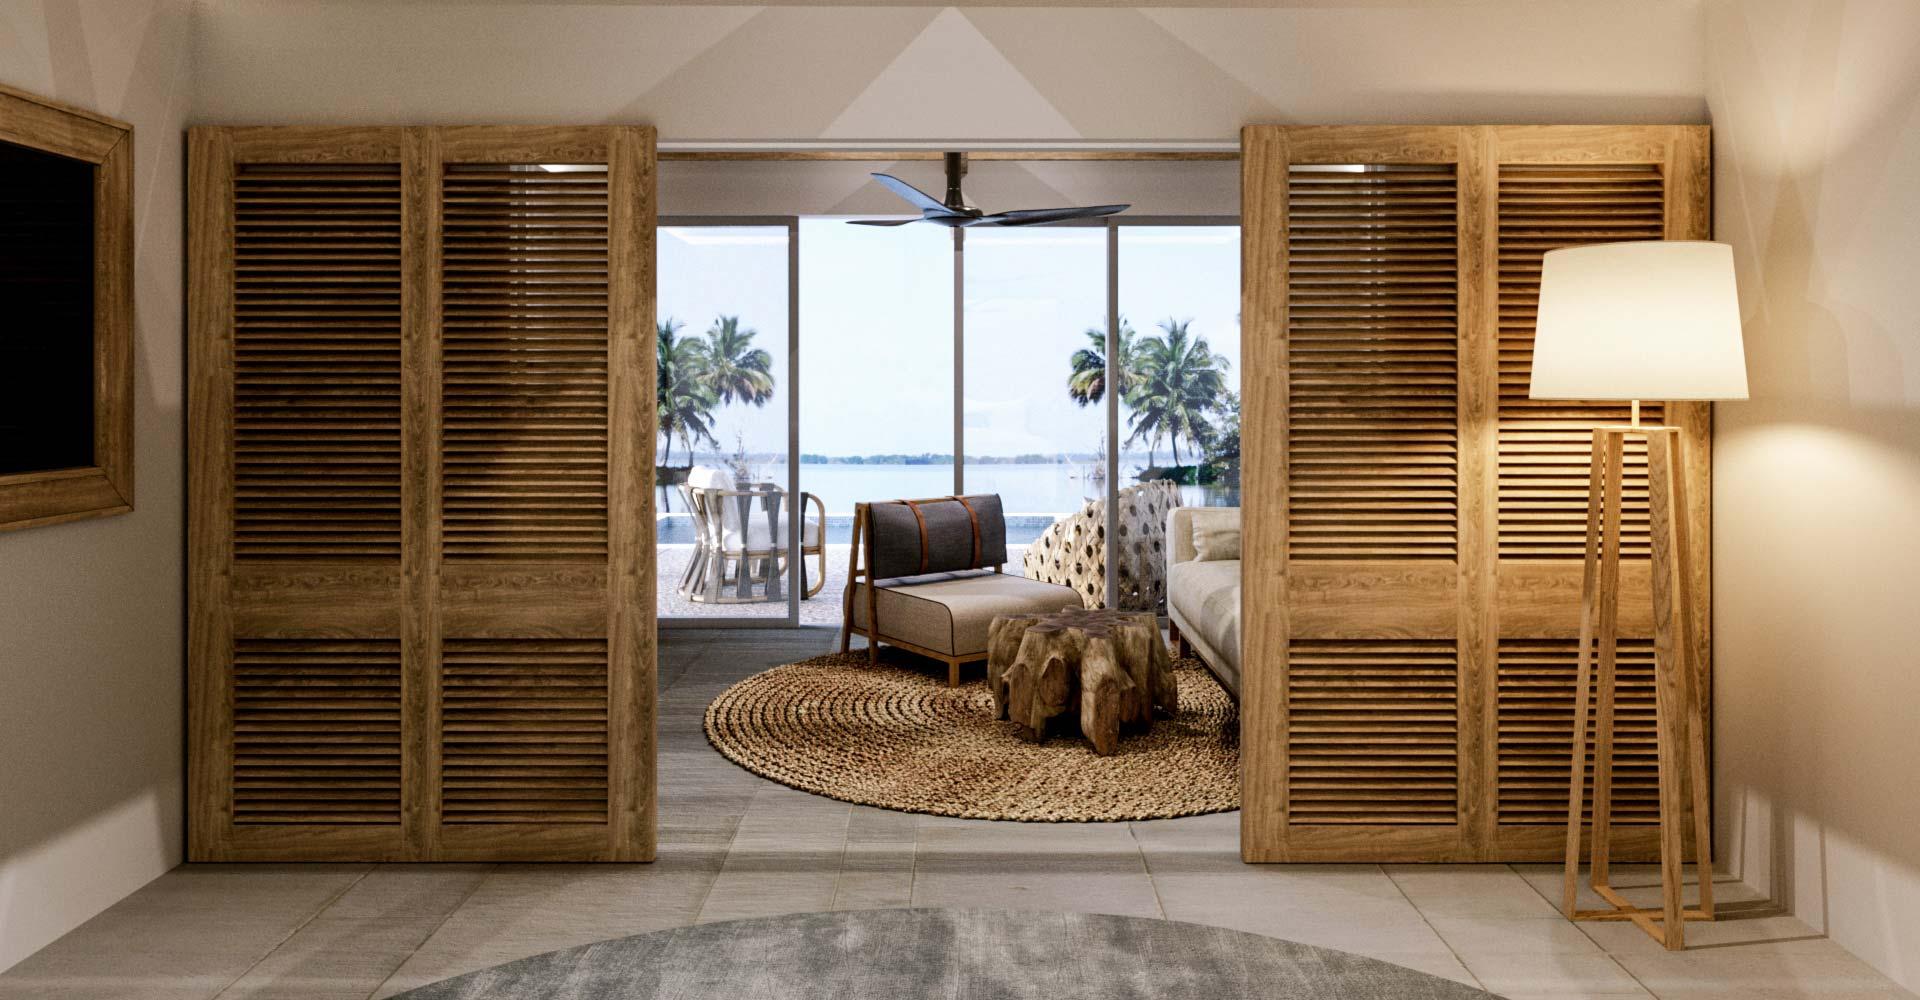 Ibiza style bedroom with sea view by Costa Blanca Interior Design Studio